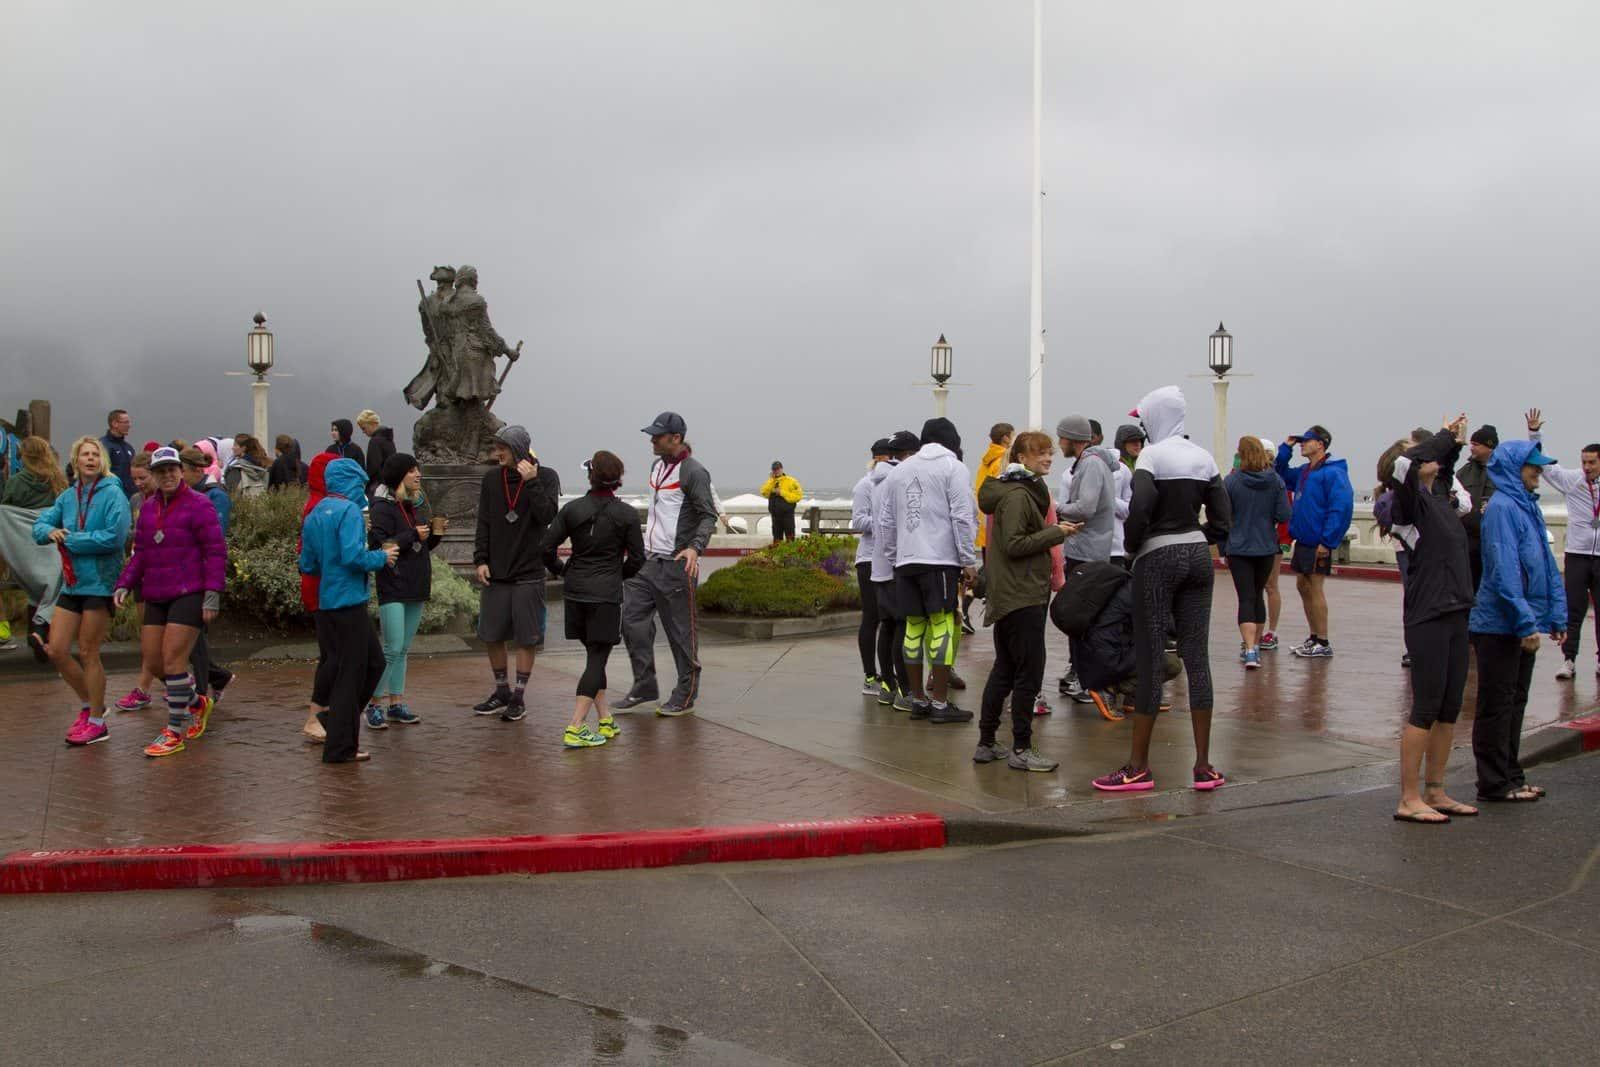 Hood to Coast Turnaround Finish Line 2015